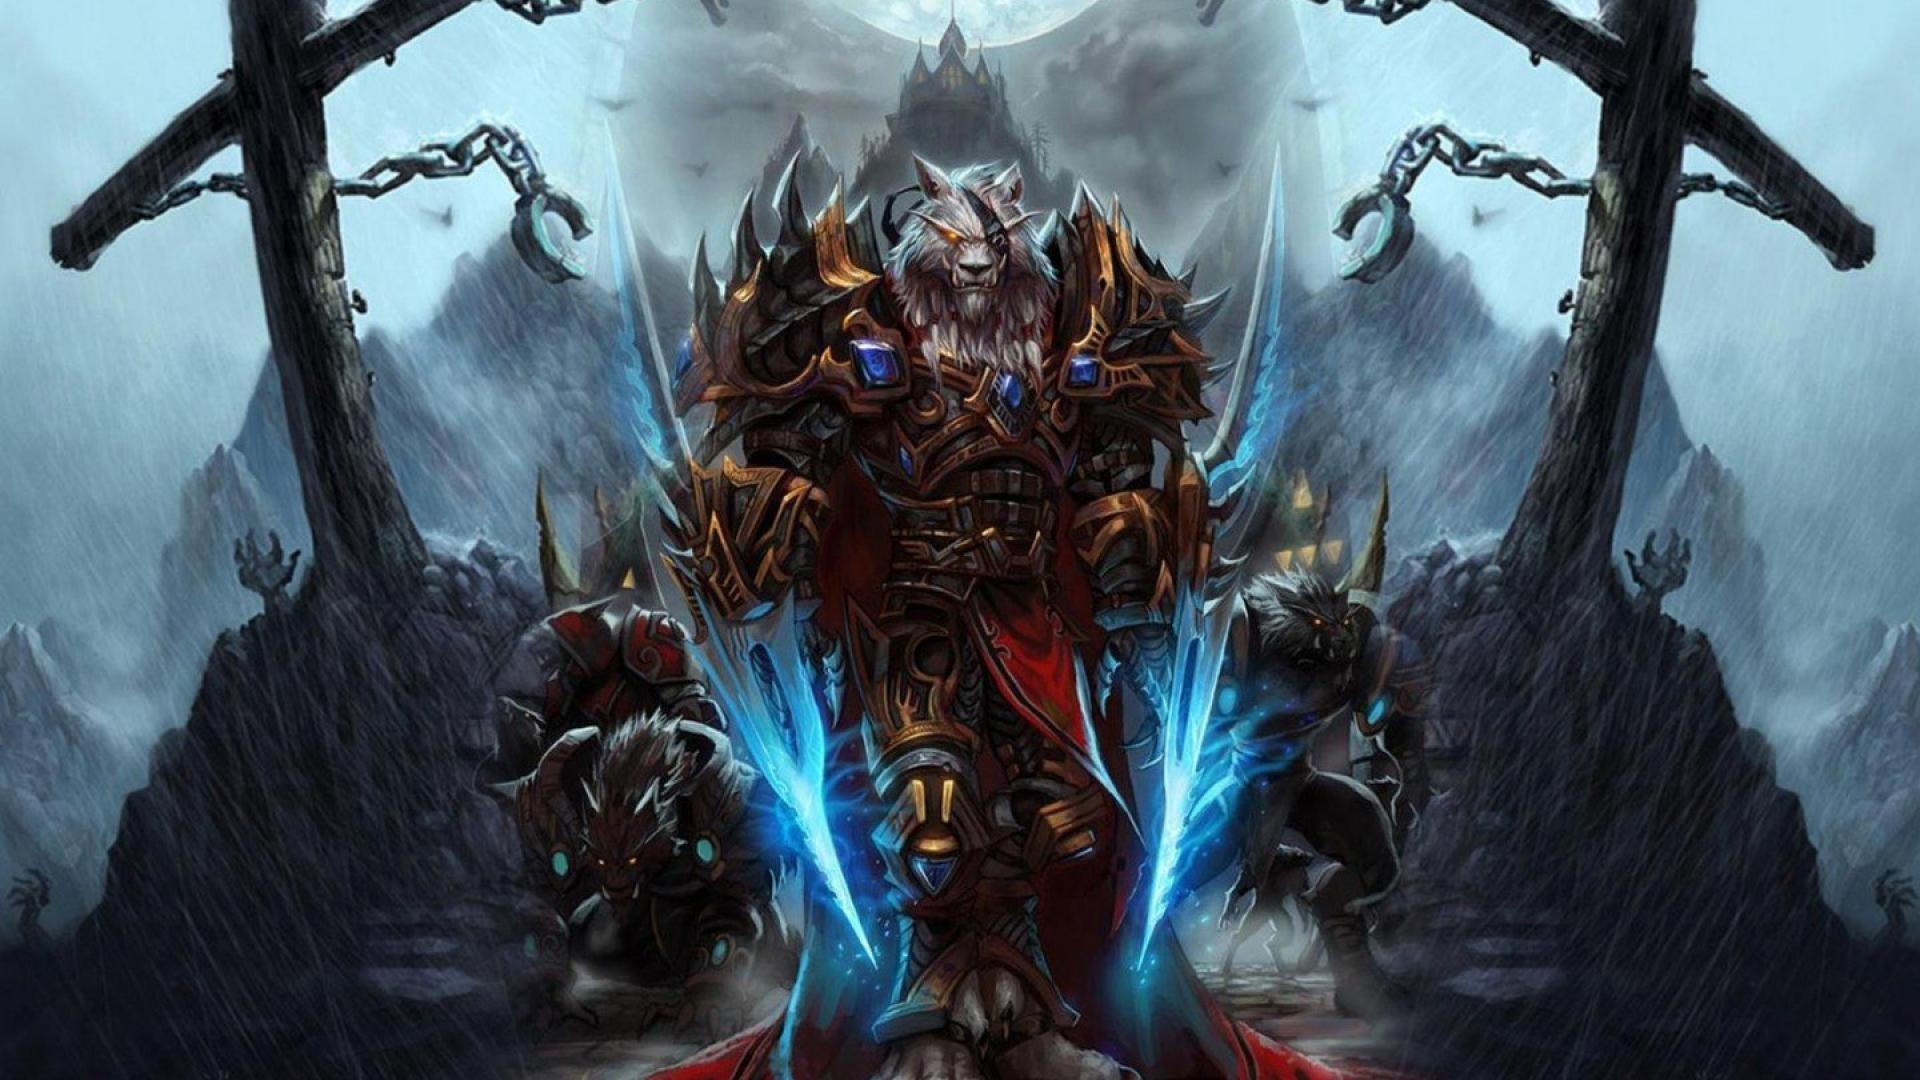 World Of Warcraft Hunter Wallpaper – wallpaper.